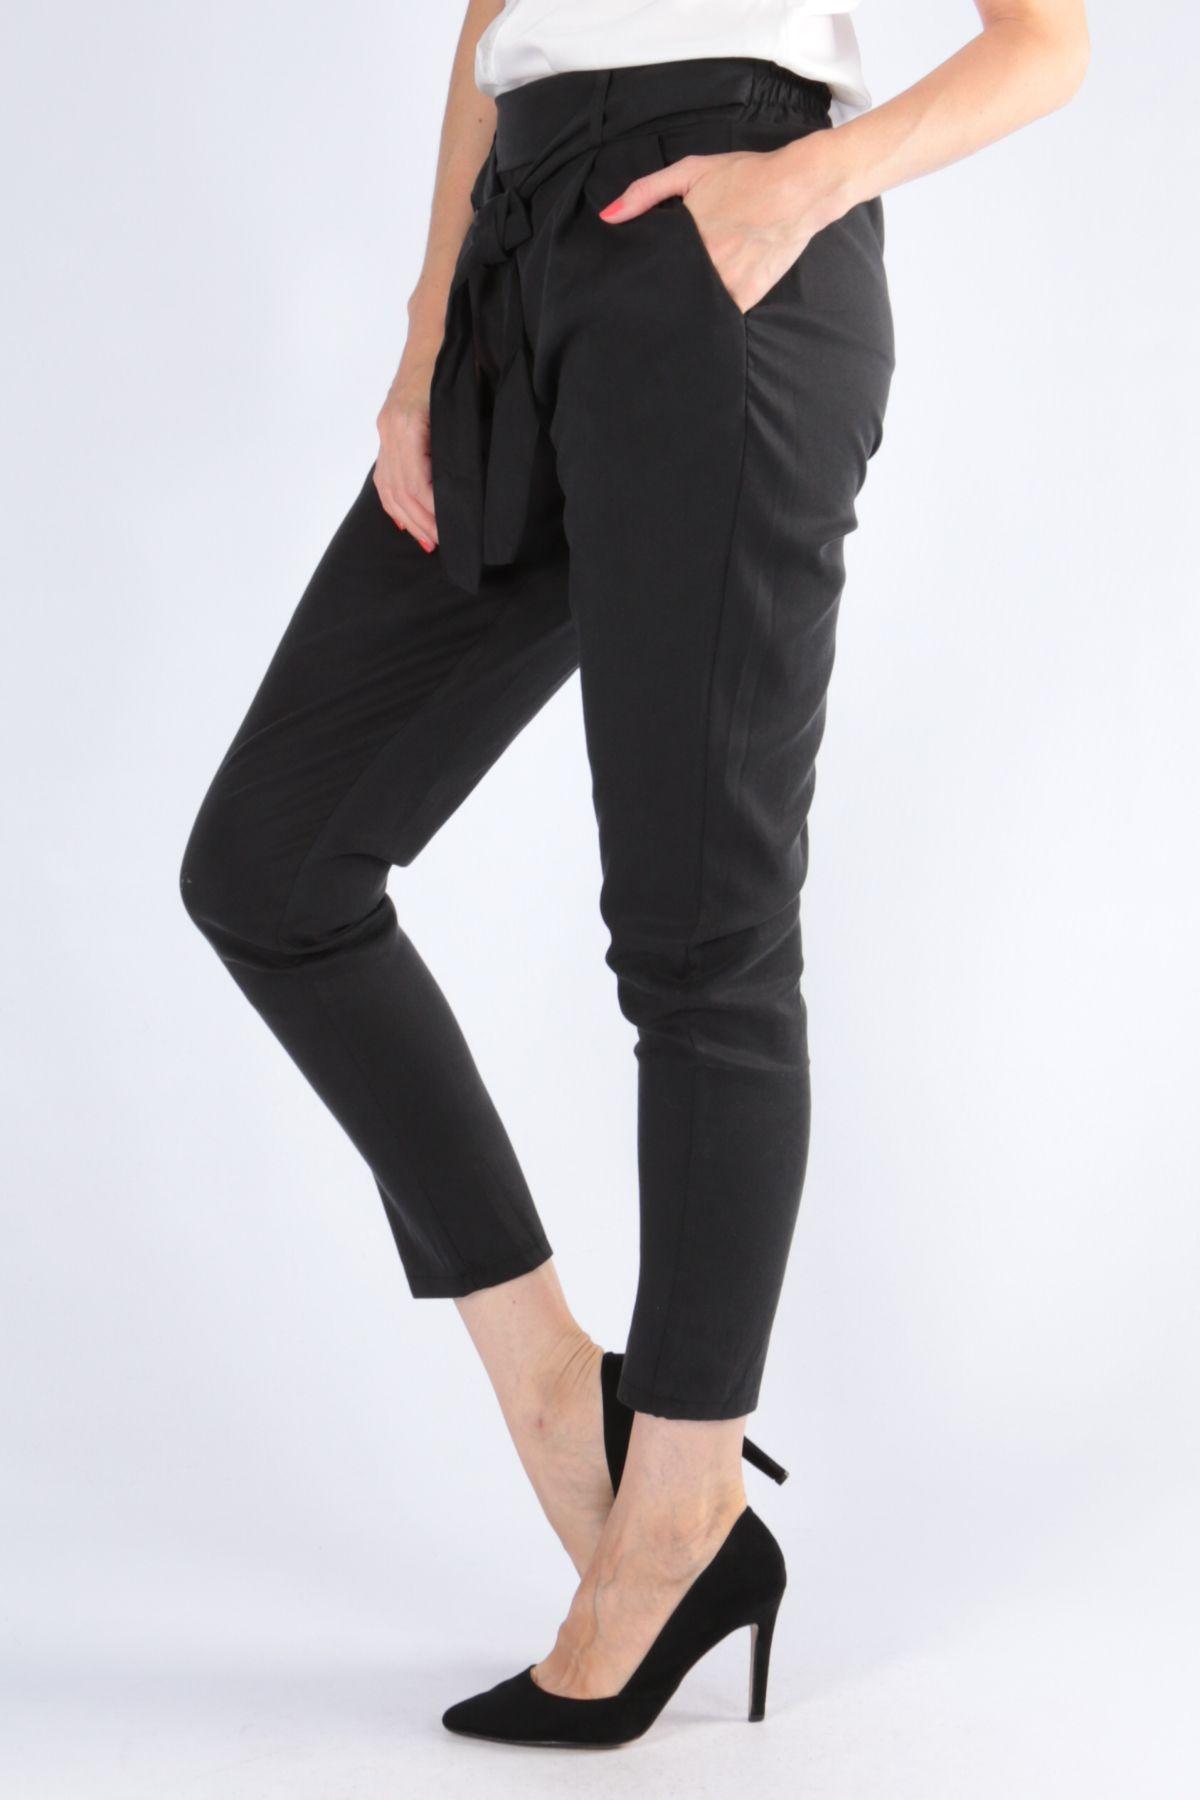 Dámske čierne nohavice s opaskom  6ed1fed334c